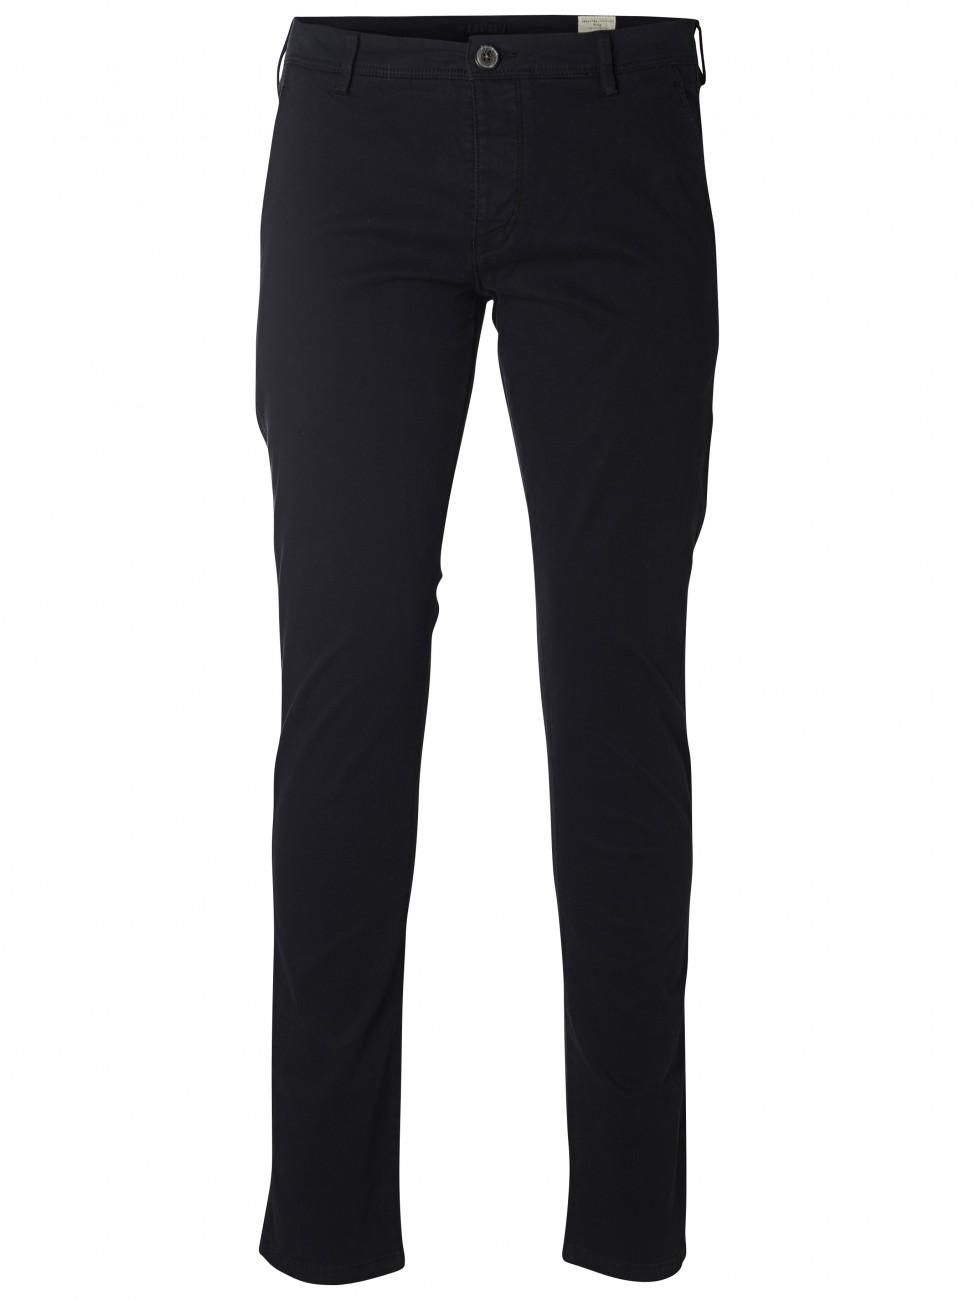 selected herren chino hose 16048091 shhoneluca black st pants noos ebay. Black Bedroom Furniture Sets. Home Design Ideas